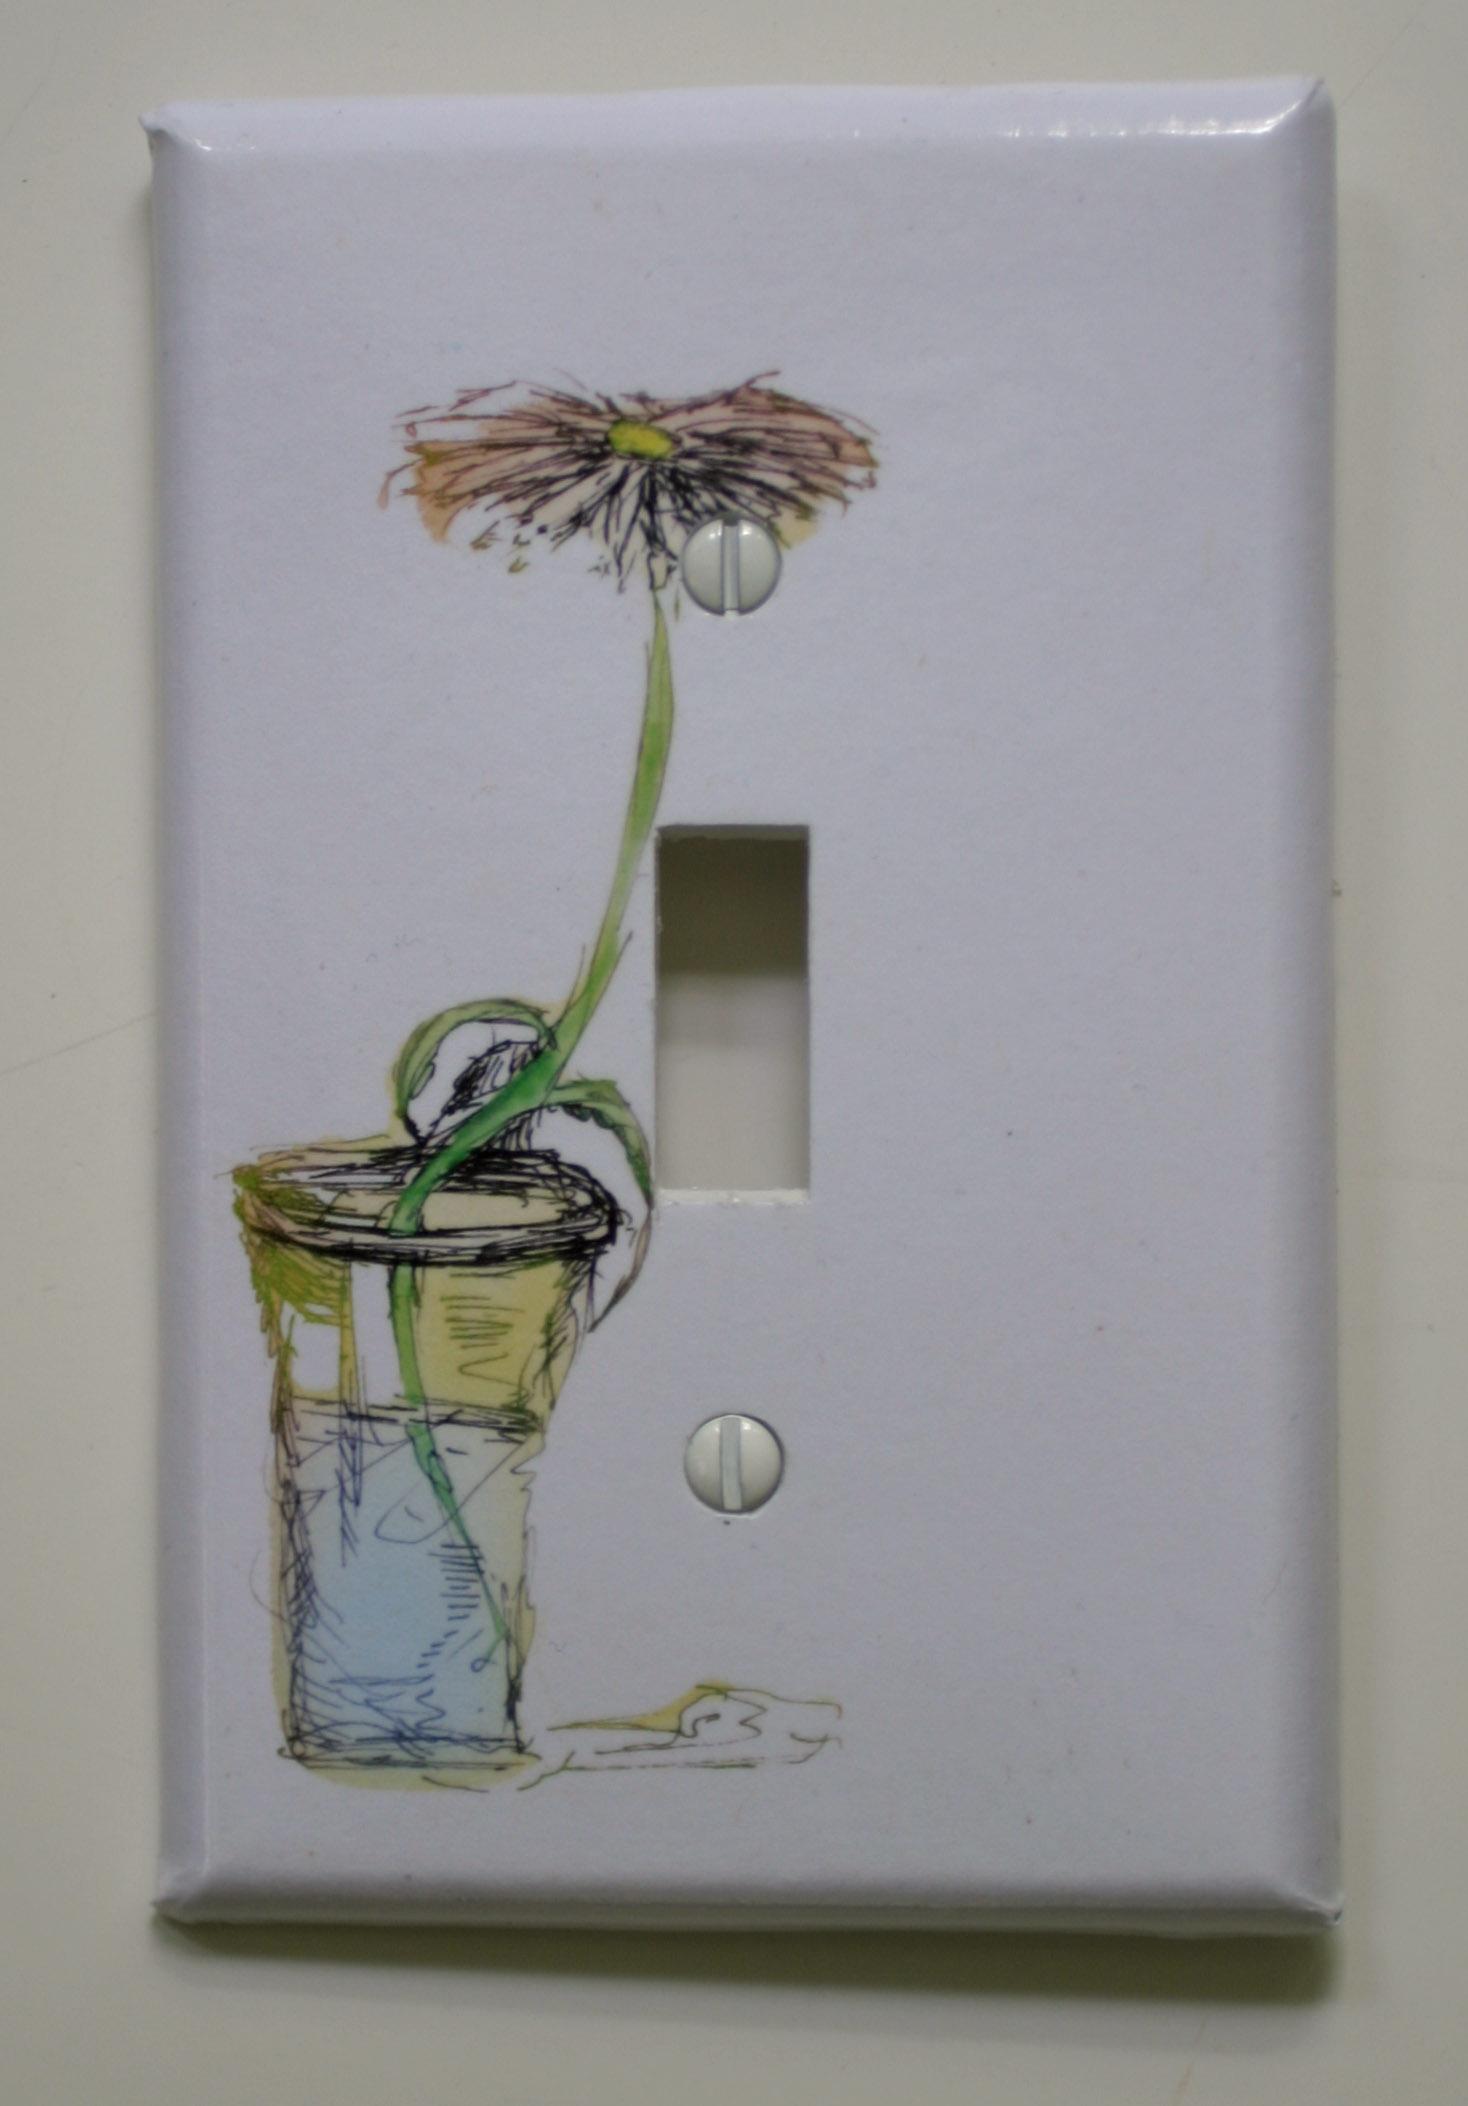 Decorative Light Switch Plate Cover Gallery IDILLARD